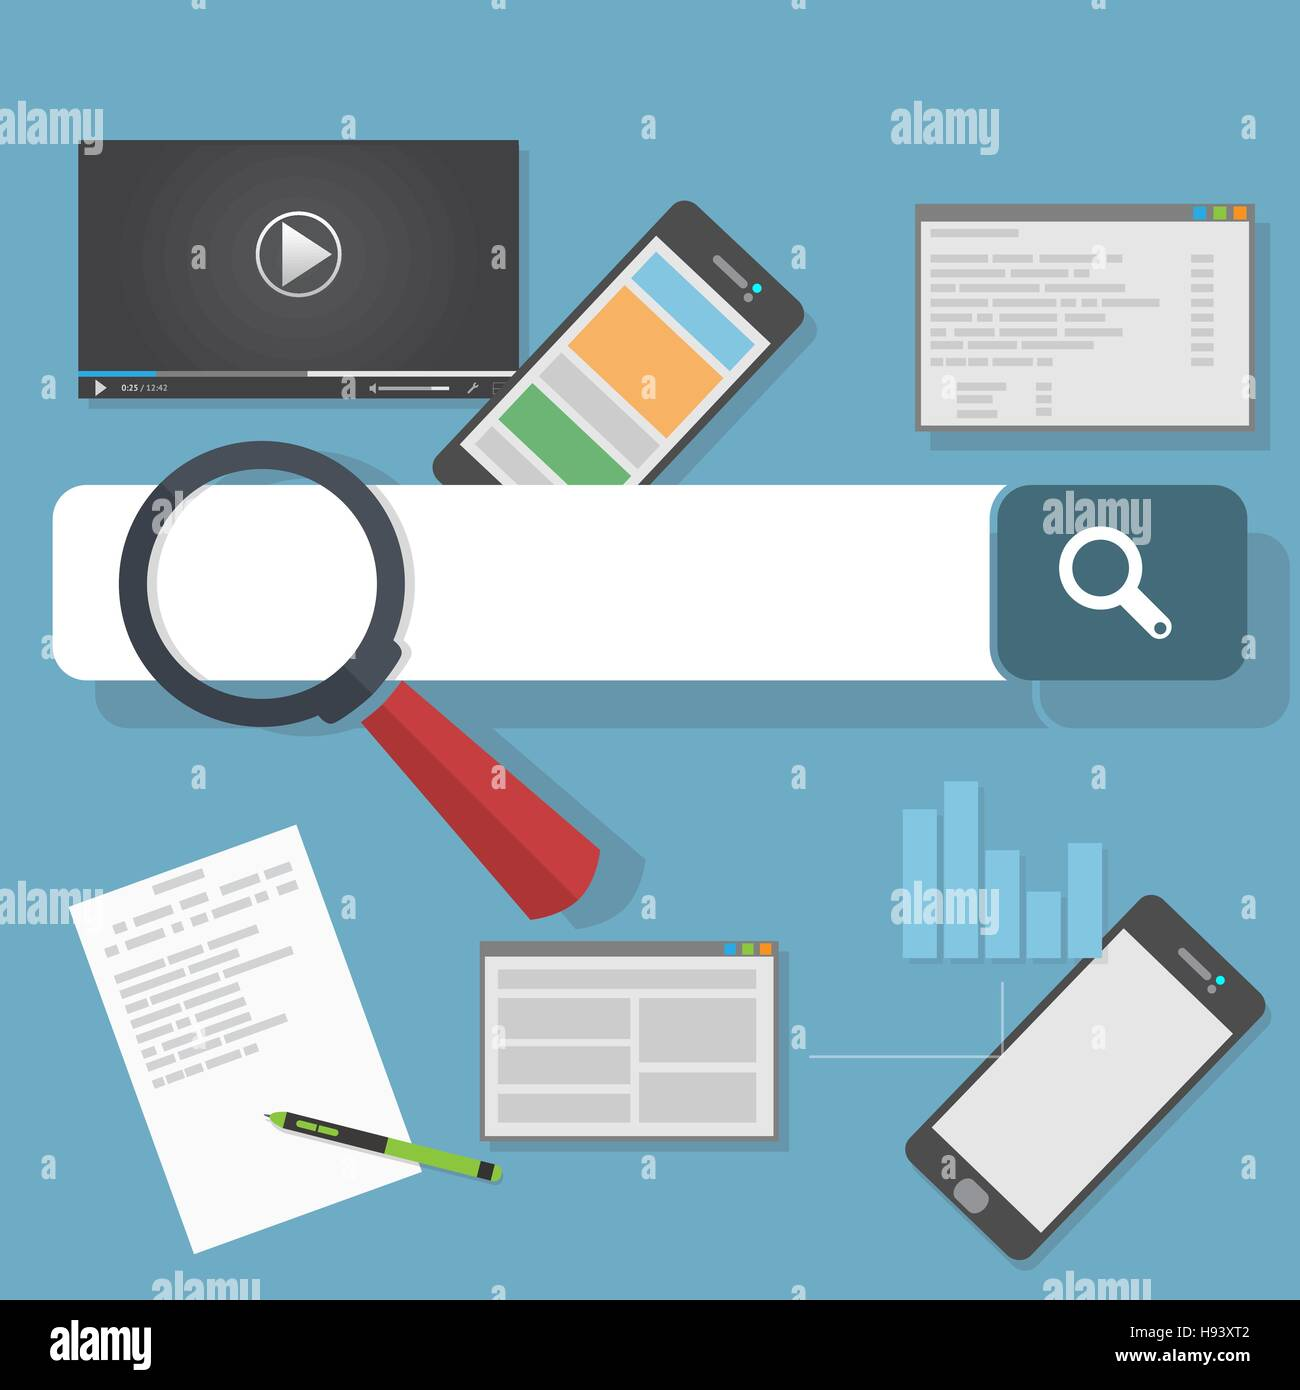 Search engine optimization illustration. SEO analytics and web development flat icons. - Stock Vector